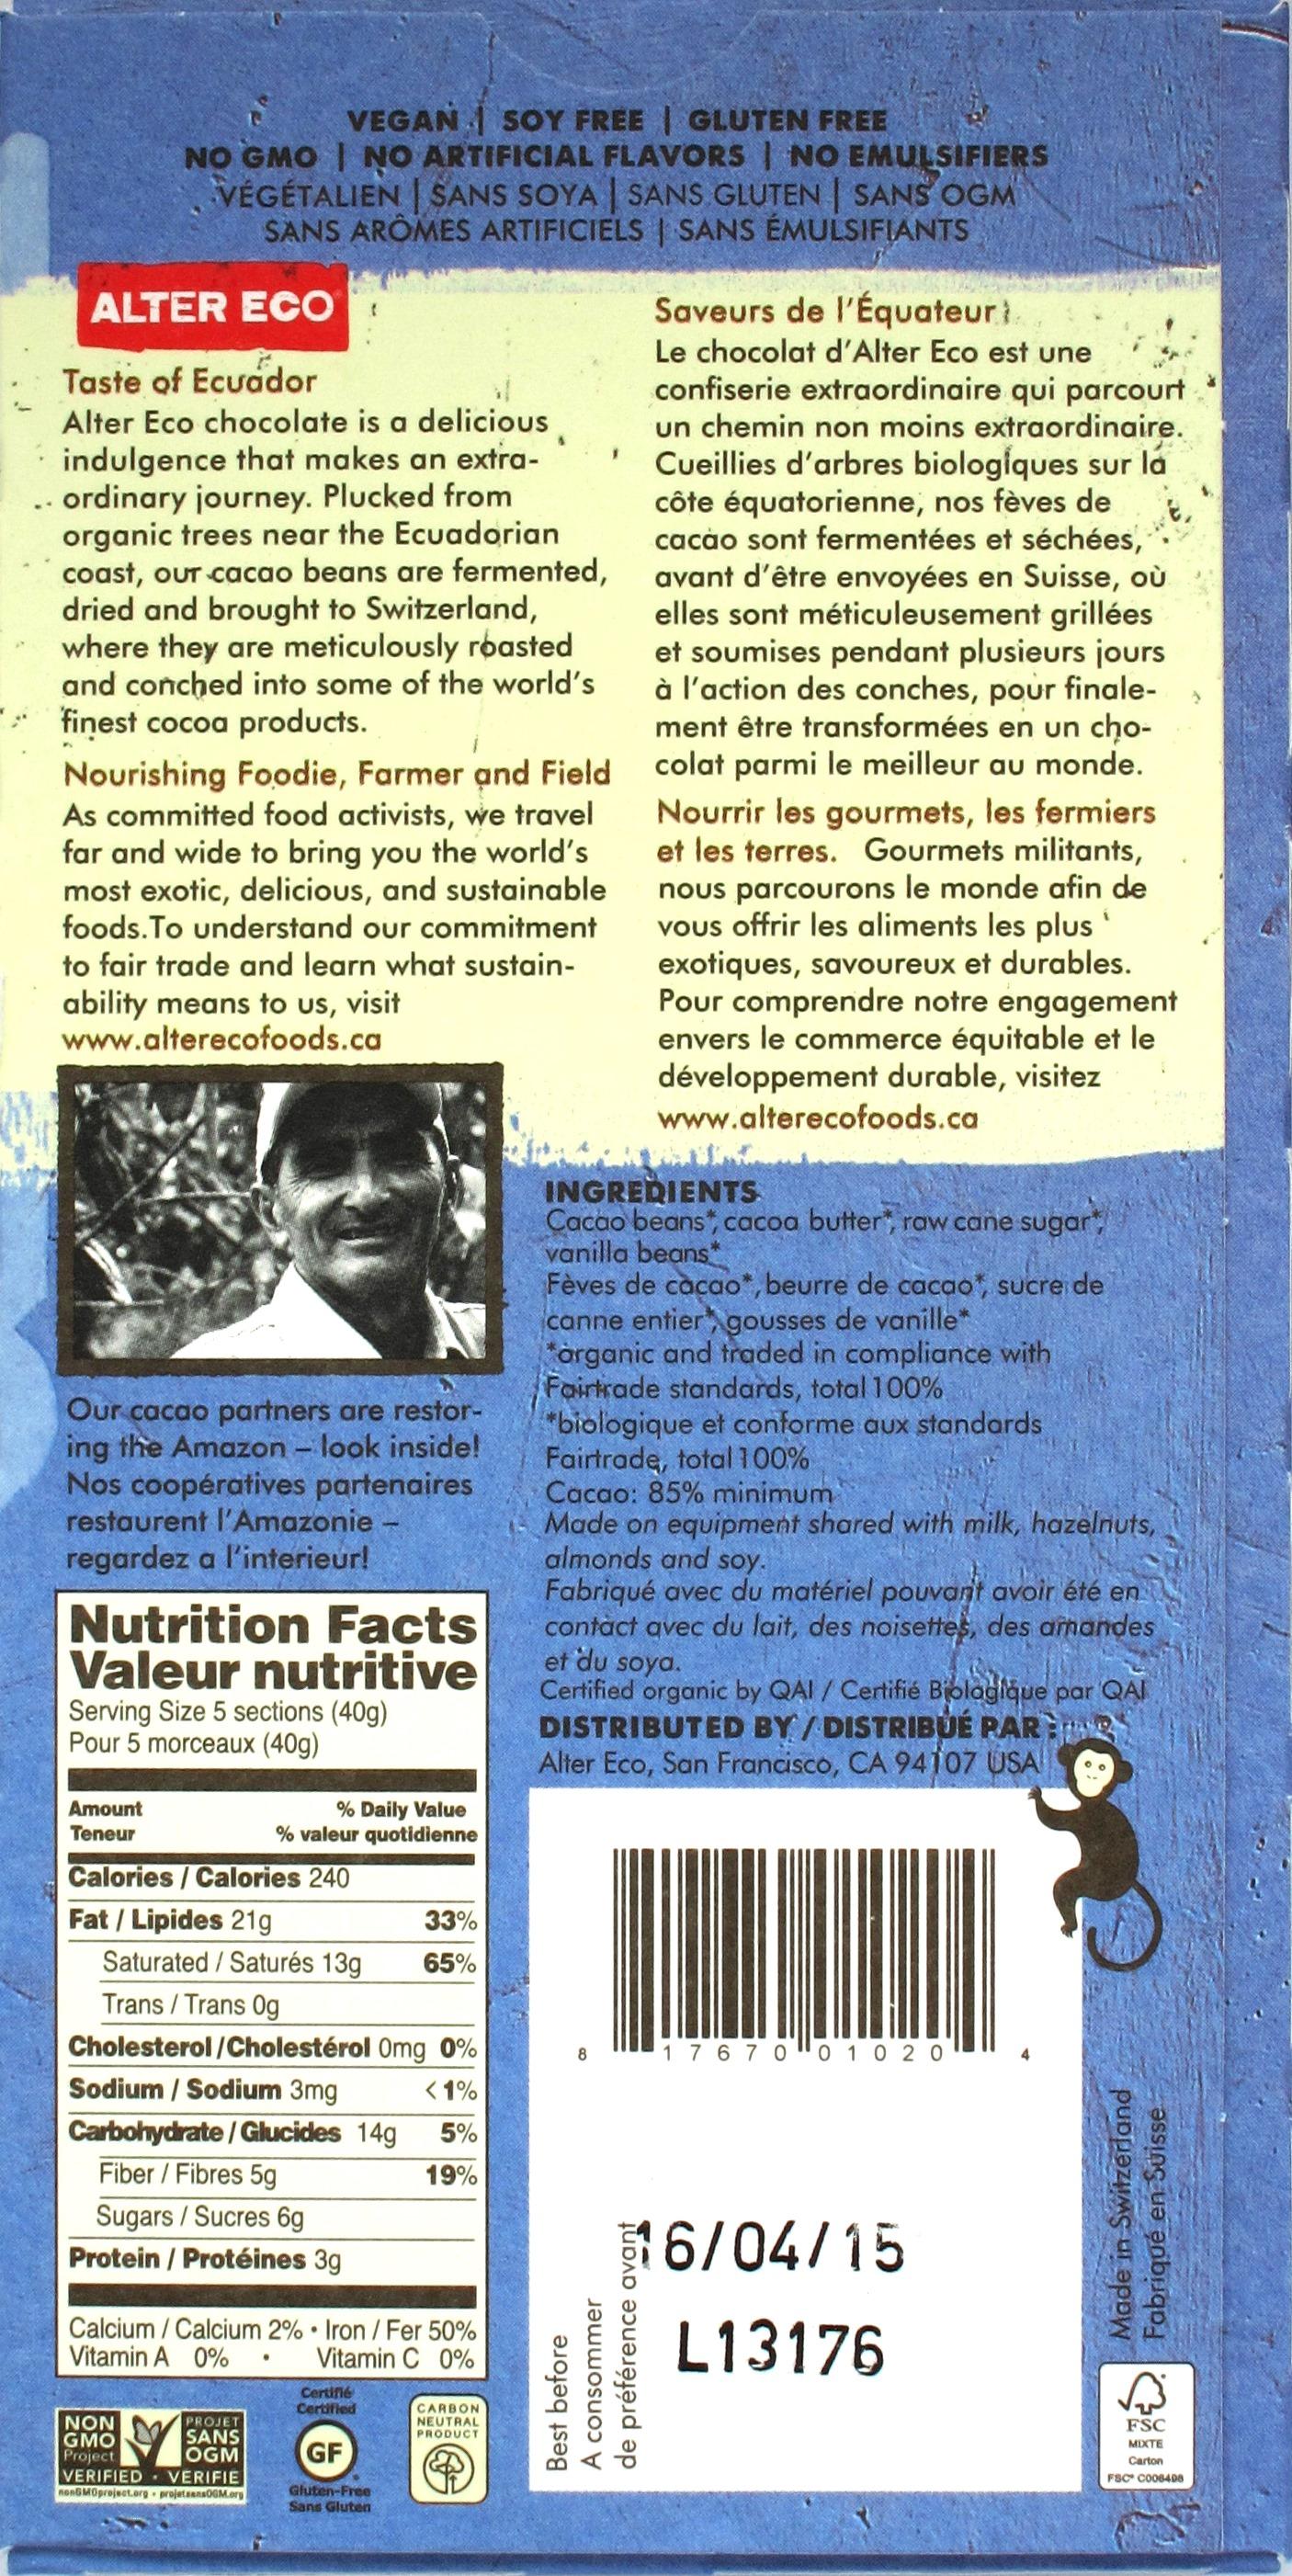 Alter Eco Bio-Fairtrade-Schokolade 85%, Inhaltsangaben